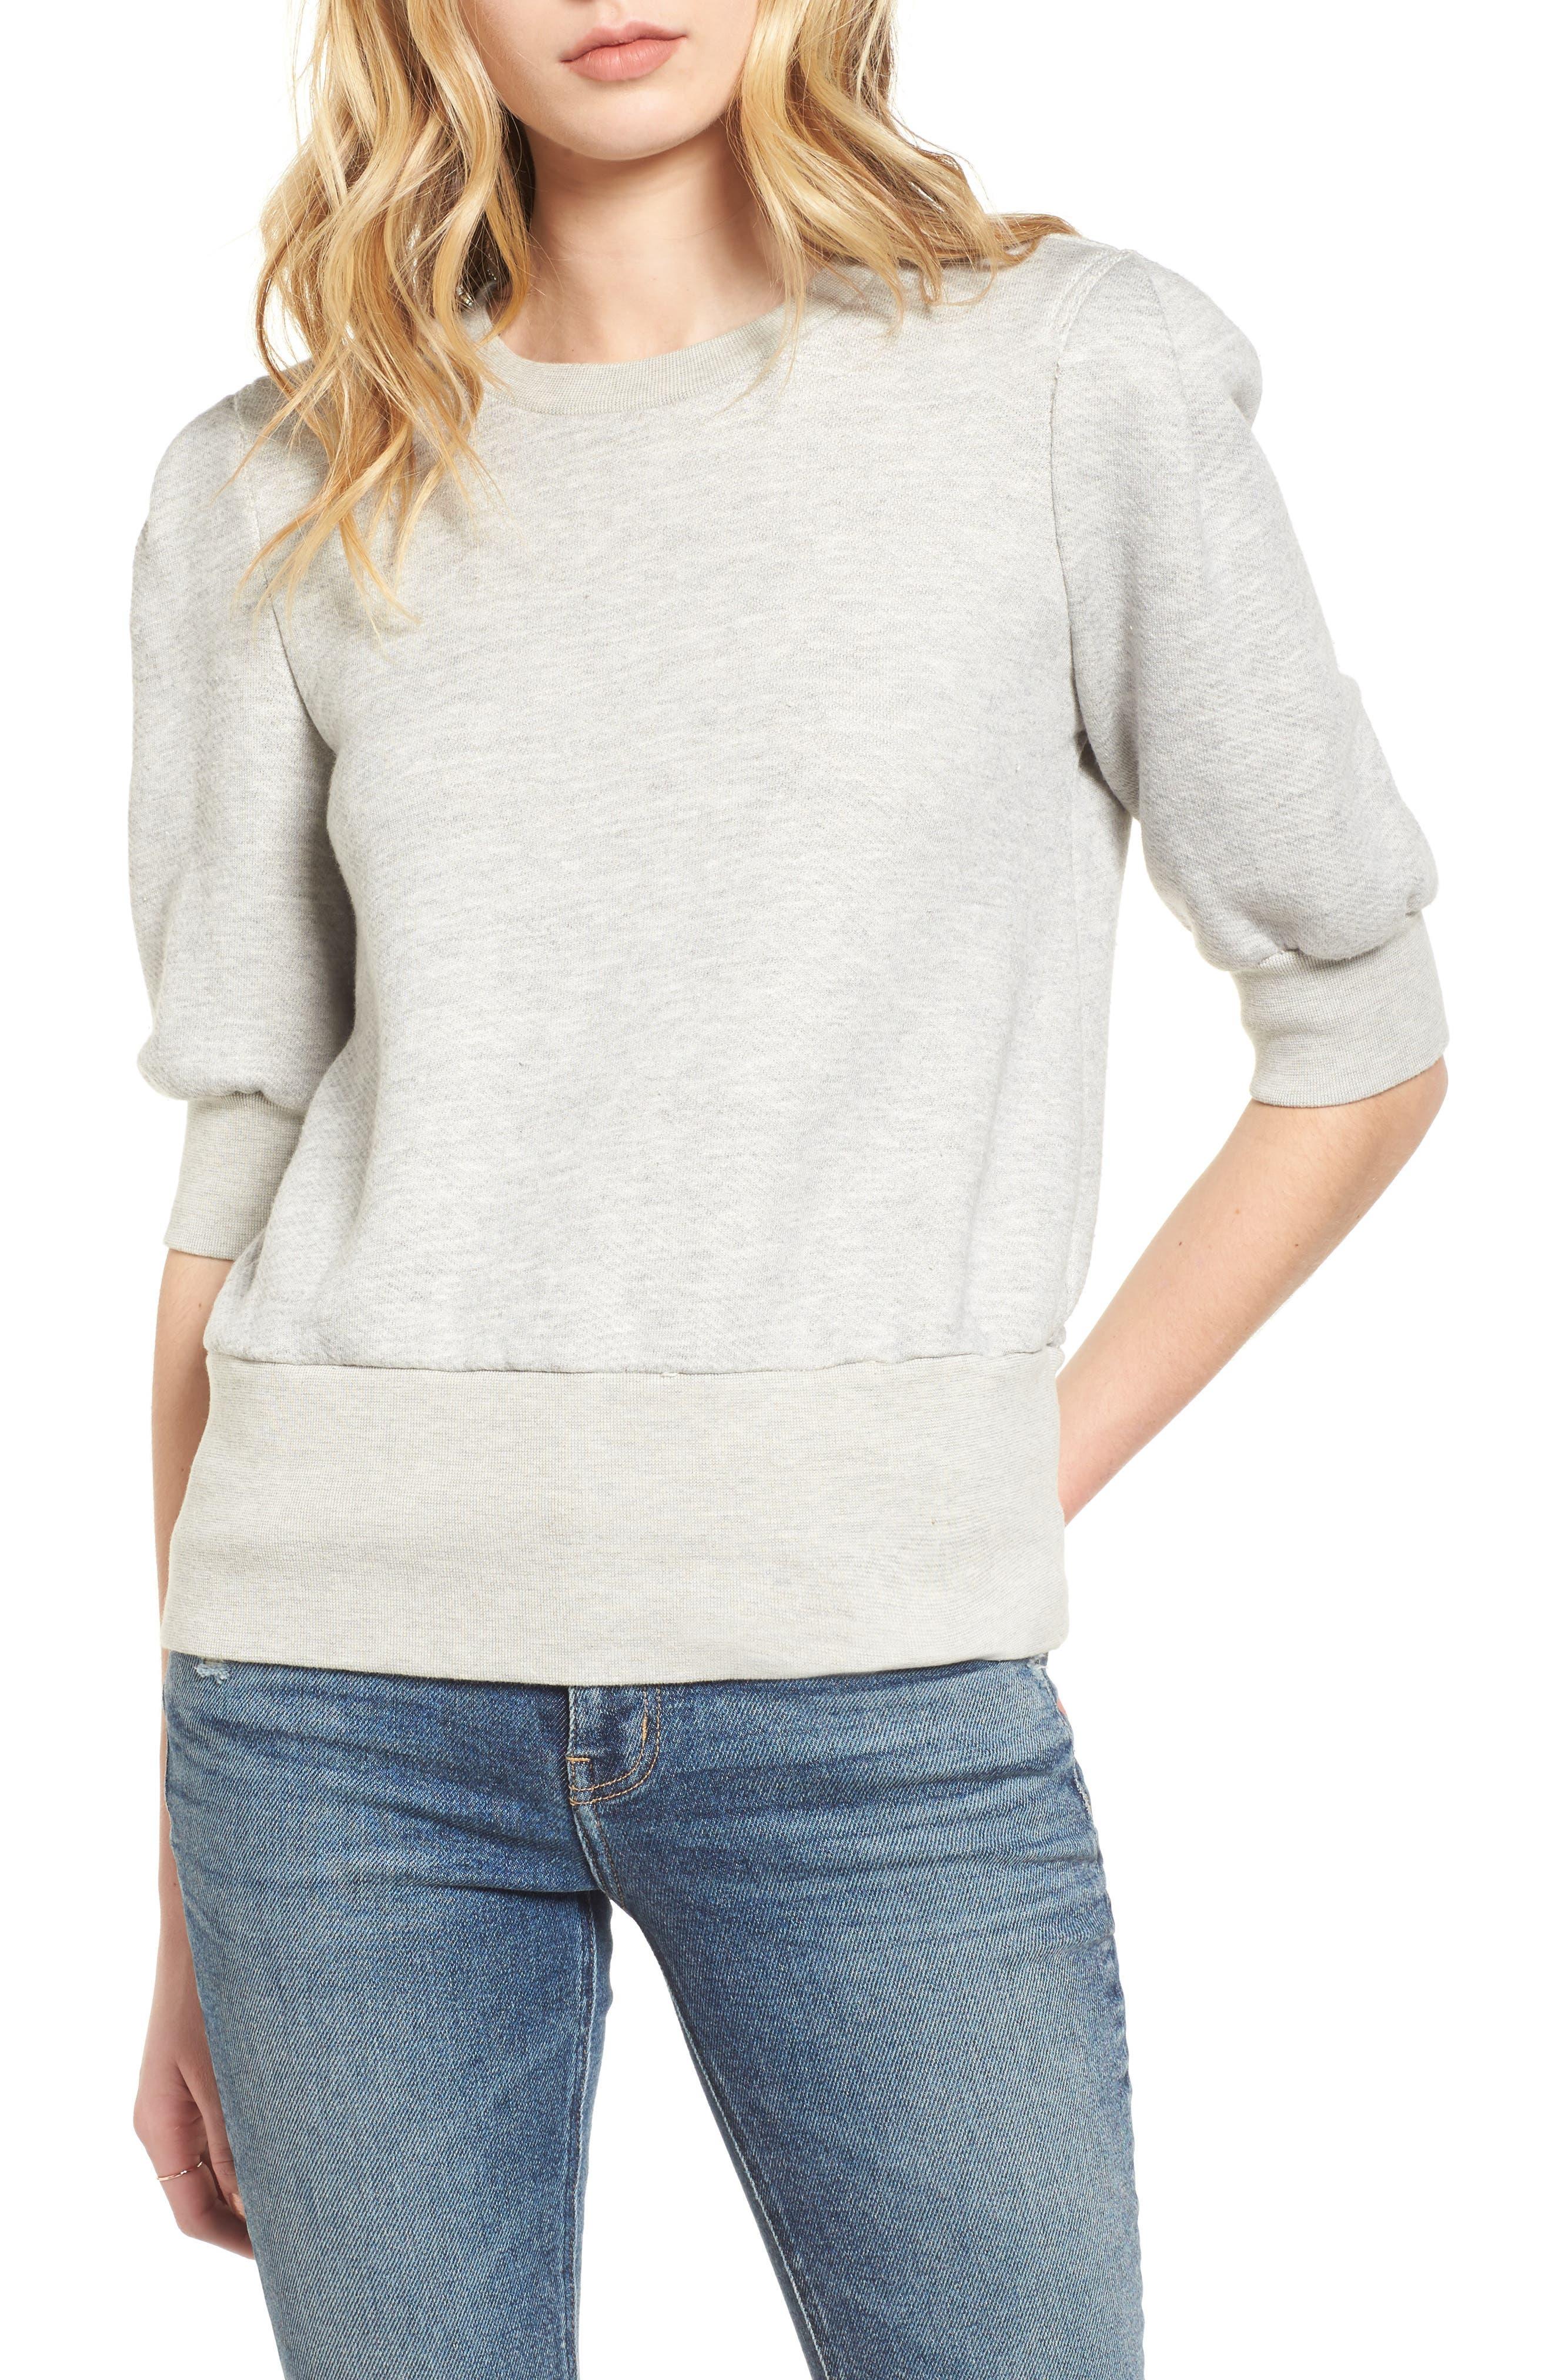 The Pleat Sweatshirt,                         Main,                         color, Light Heather Grey Terry